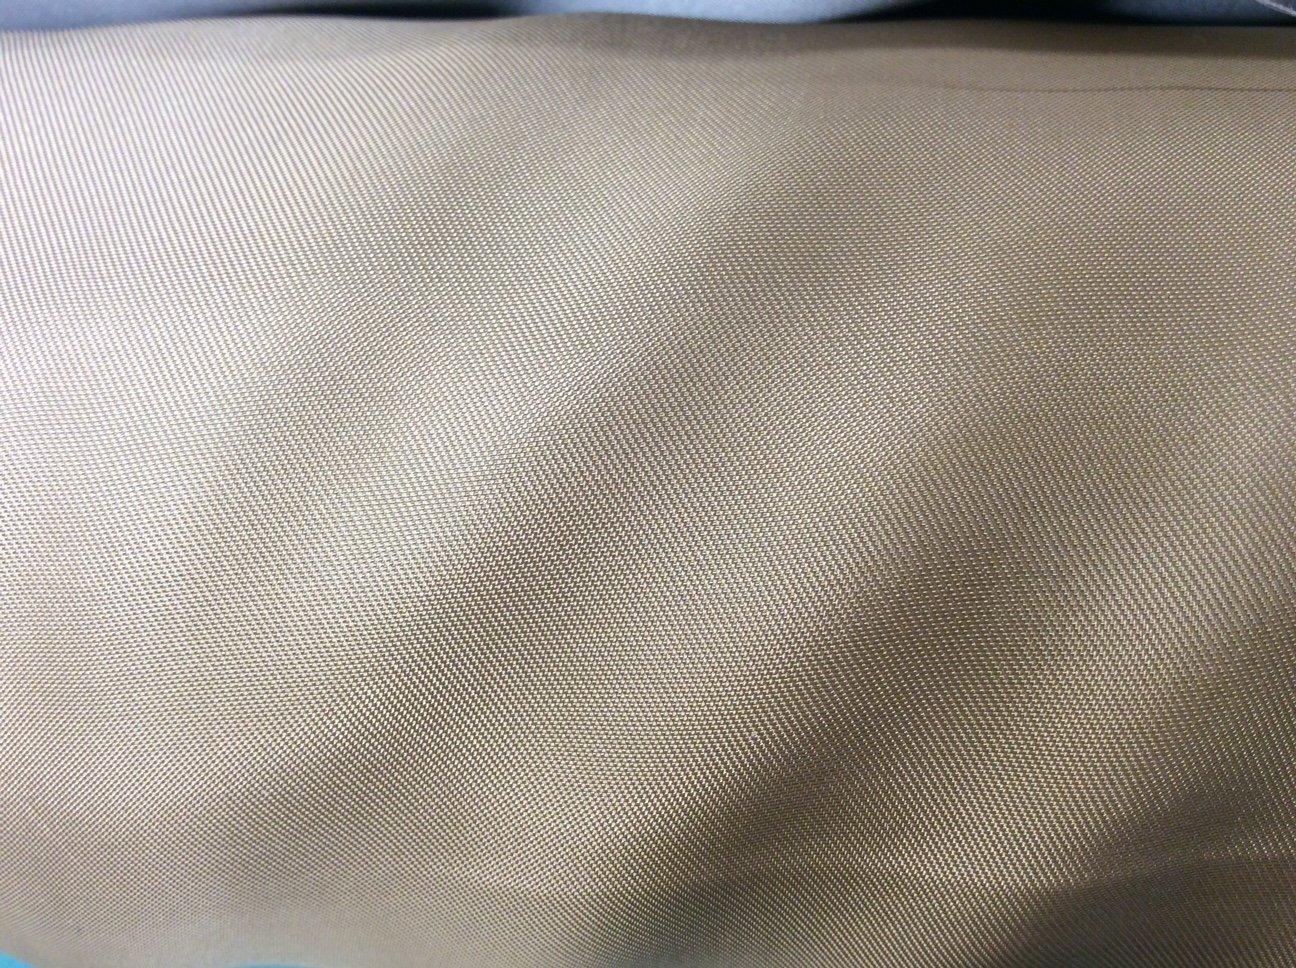 Bemberg Rayon Lining - Tan